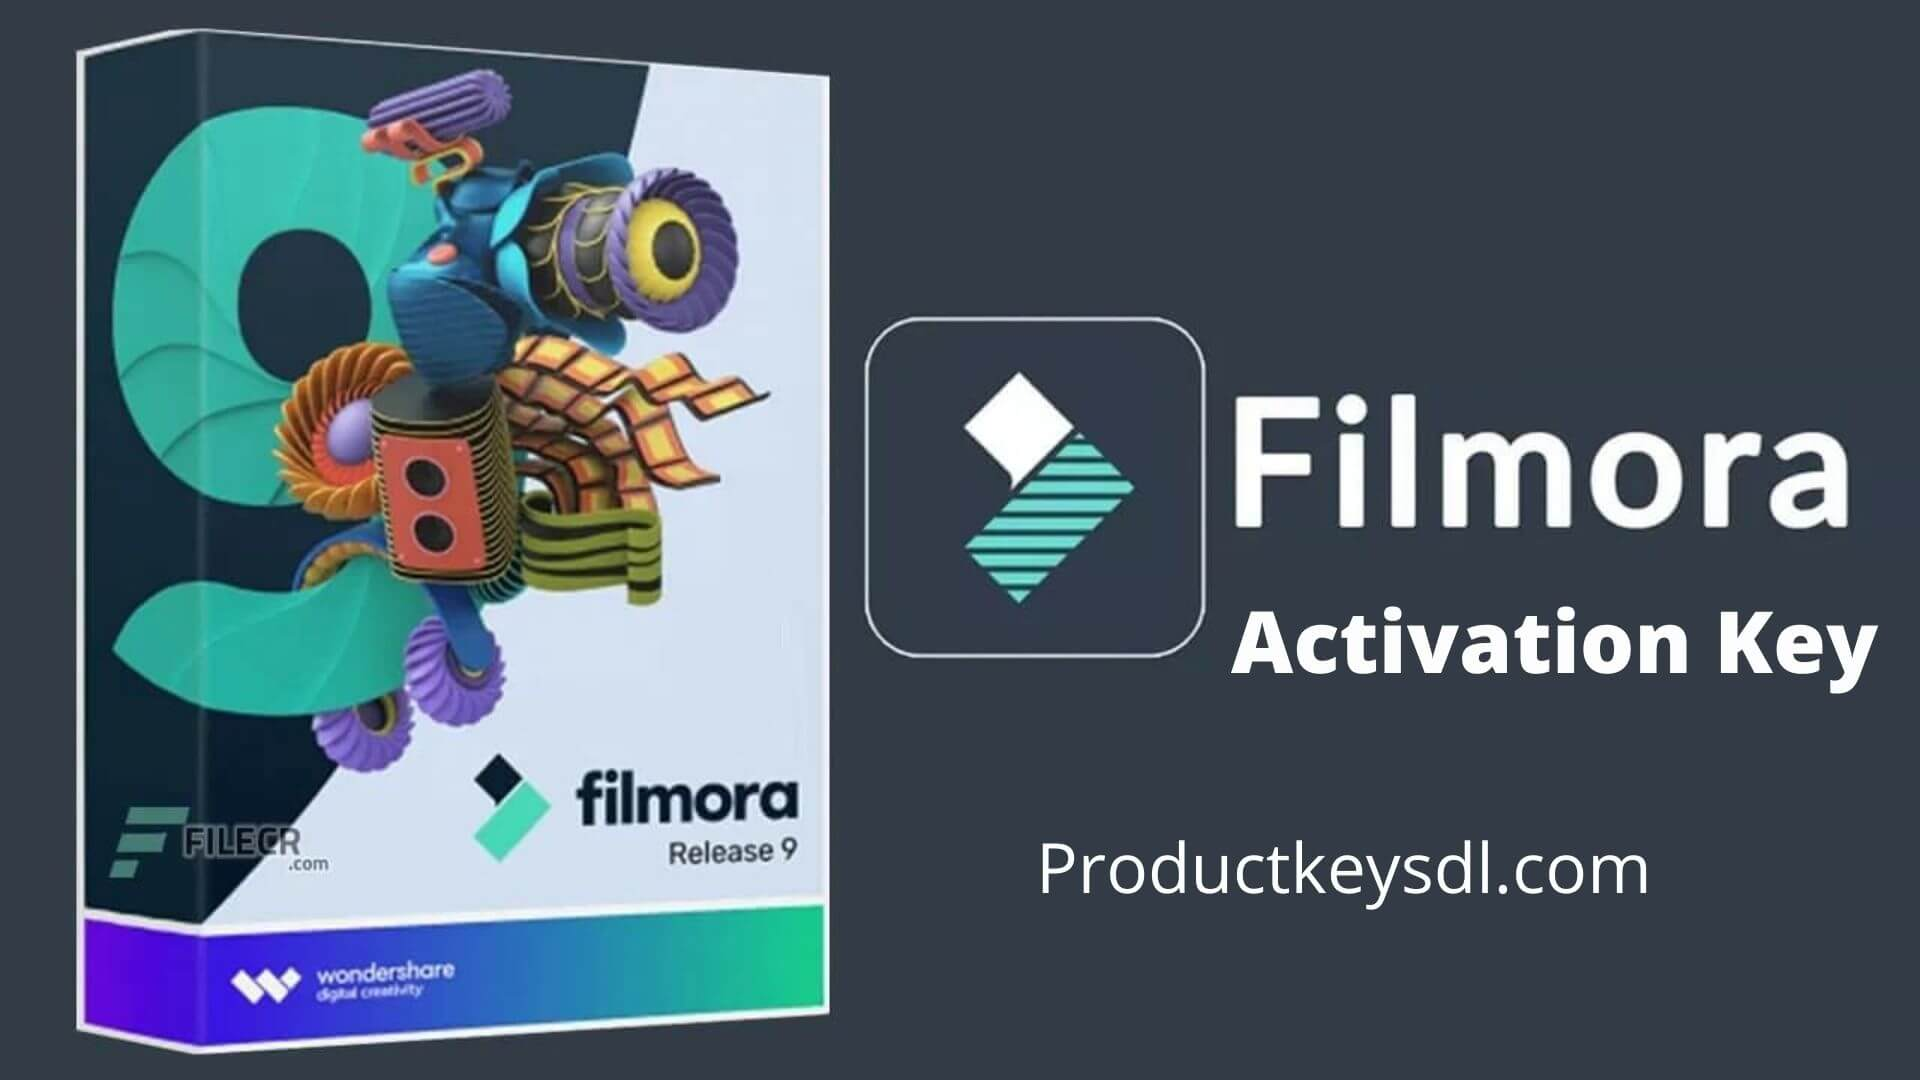 Wondershare Filmora activation key